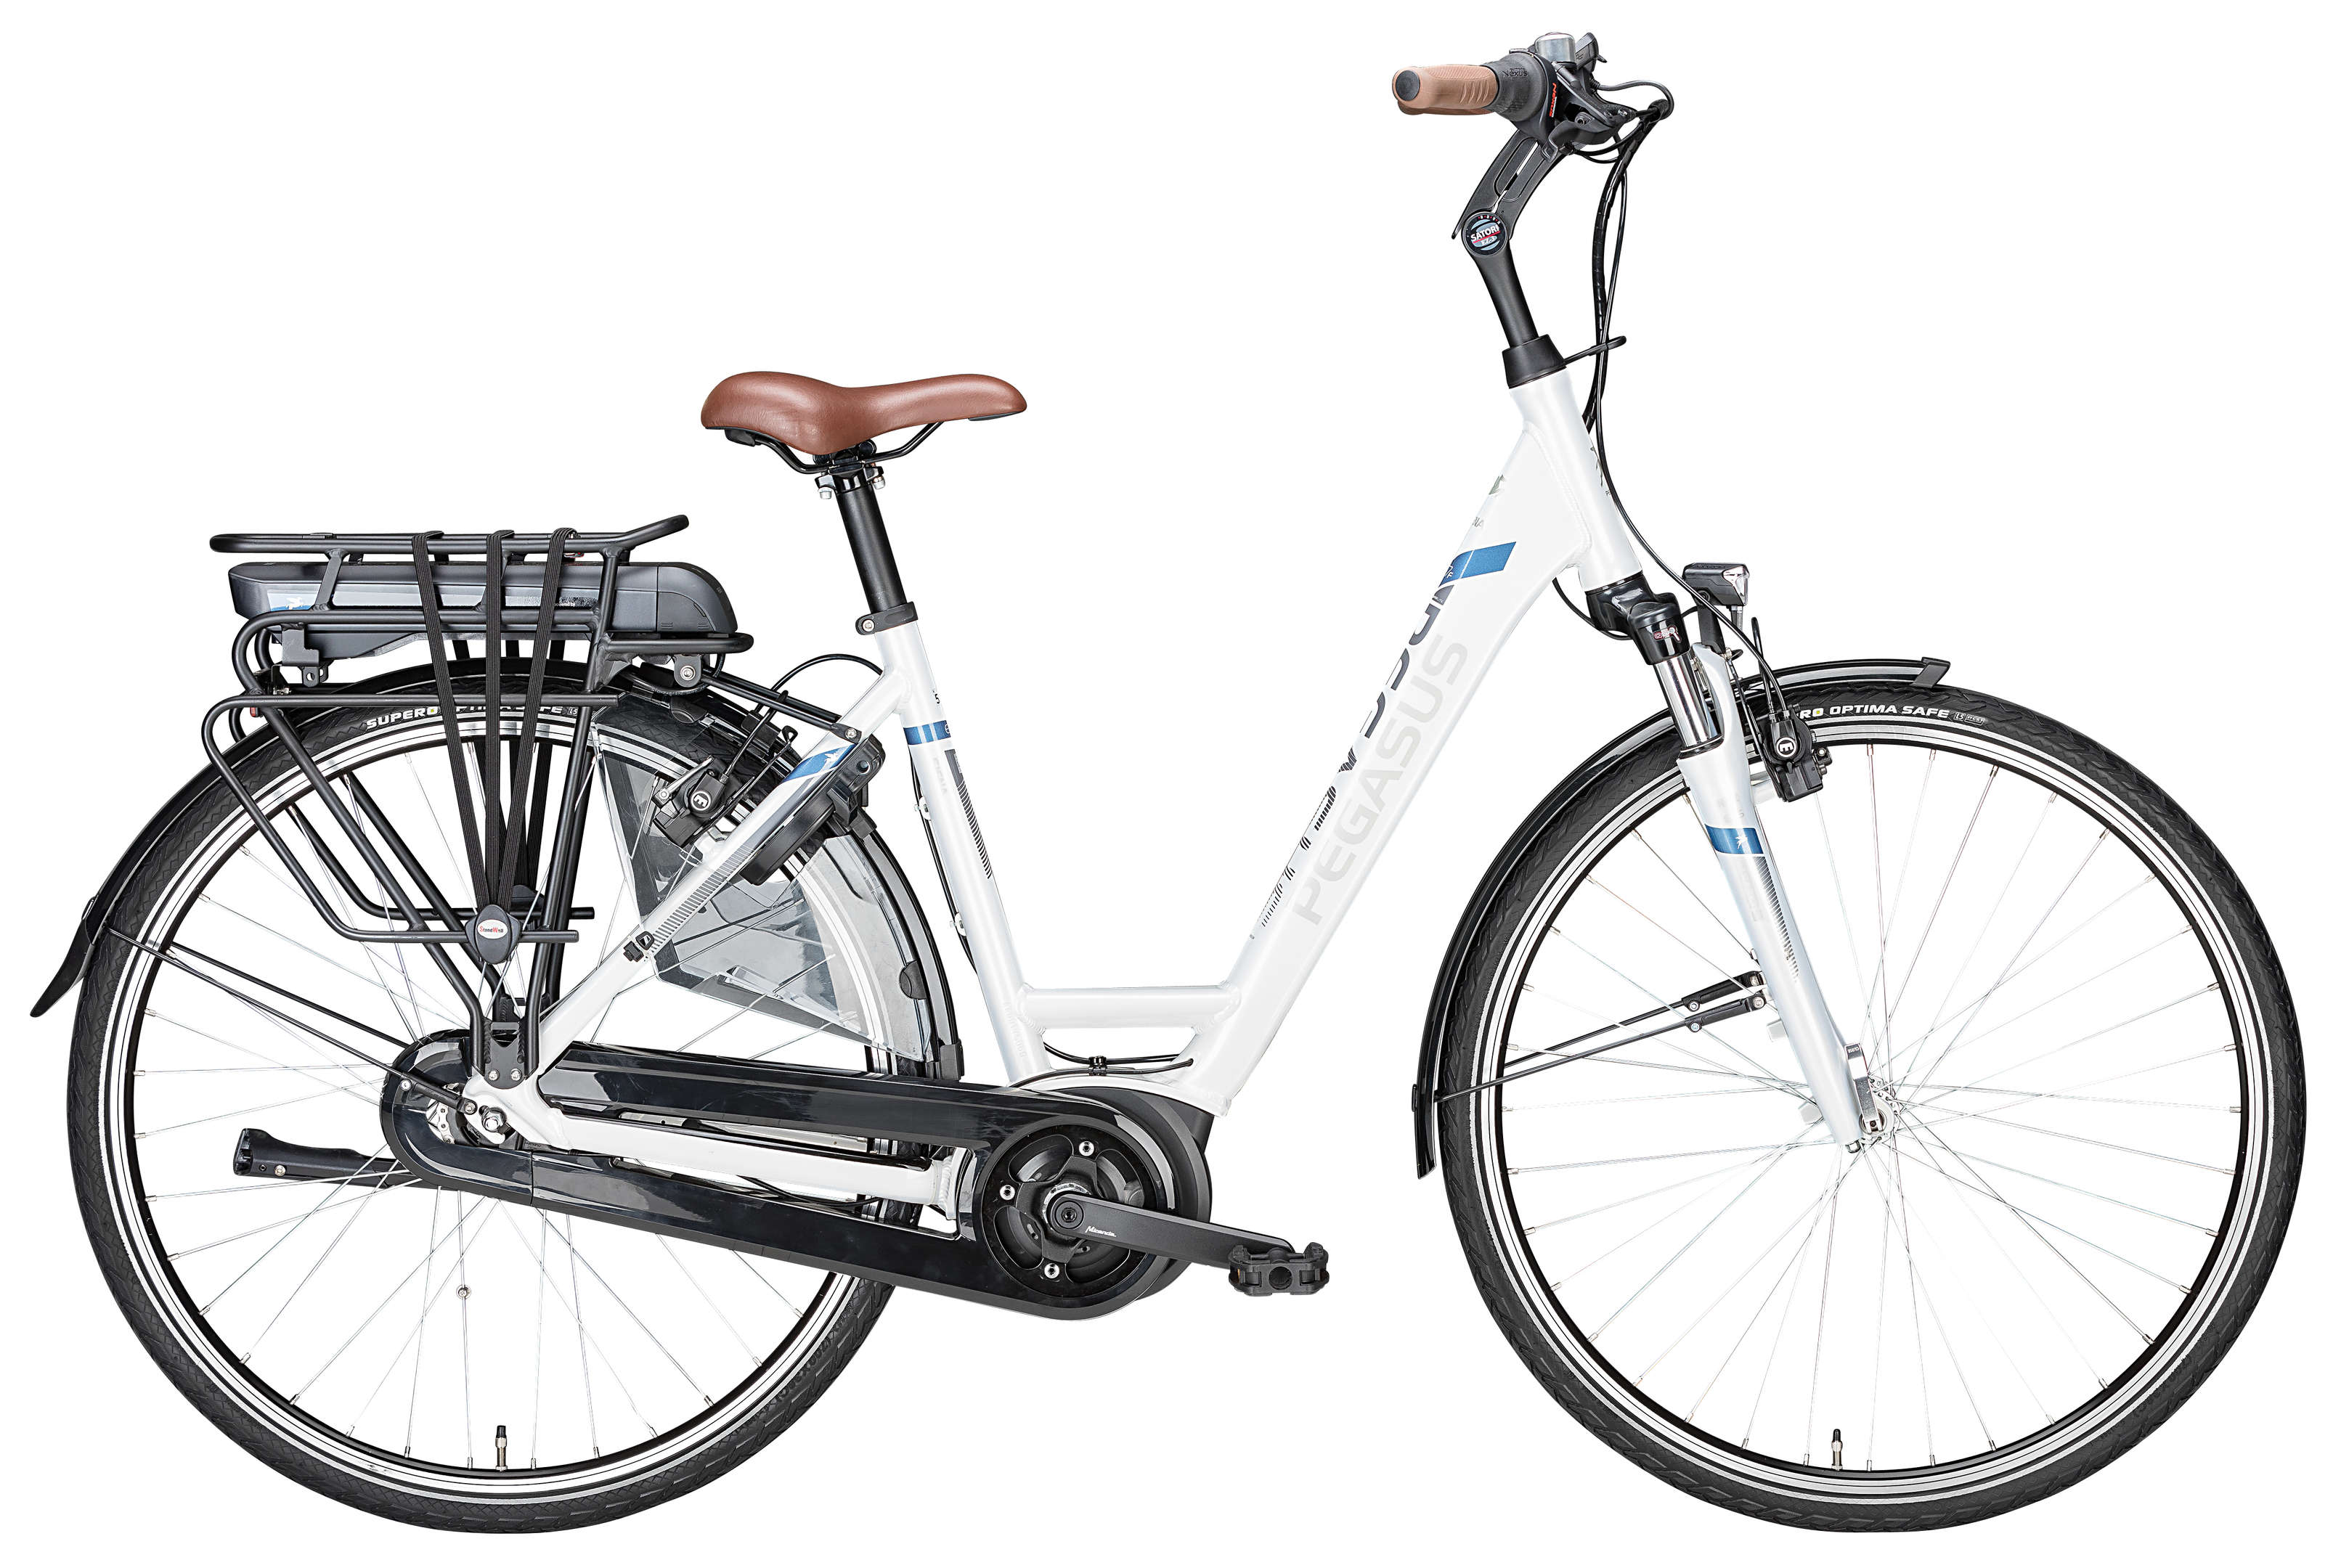 pegasus e bike siena e7f eurorad bikeleasingeurorad. Black Bedroom Furniture Sets. Home Design Ideas